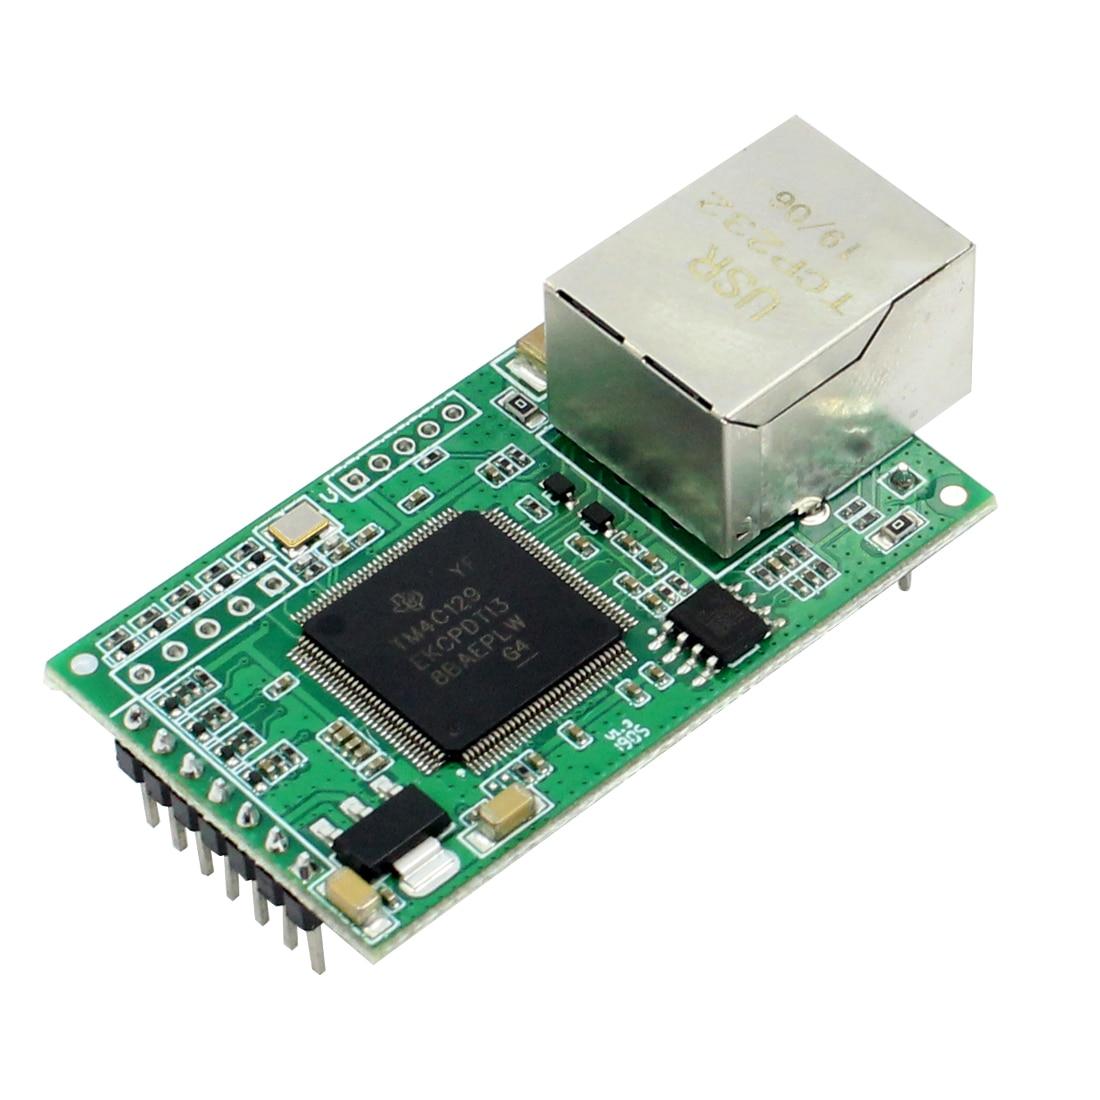 Q00226 USR-TCP232-E2 Pin Type Serial UART TTL to LAN Ethernet Module---2 serial ports